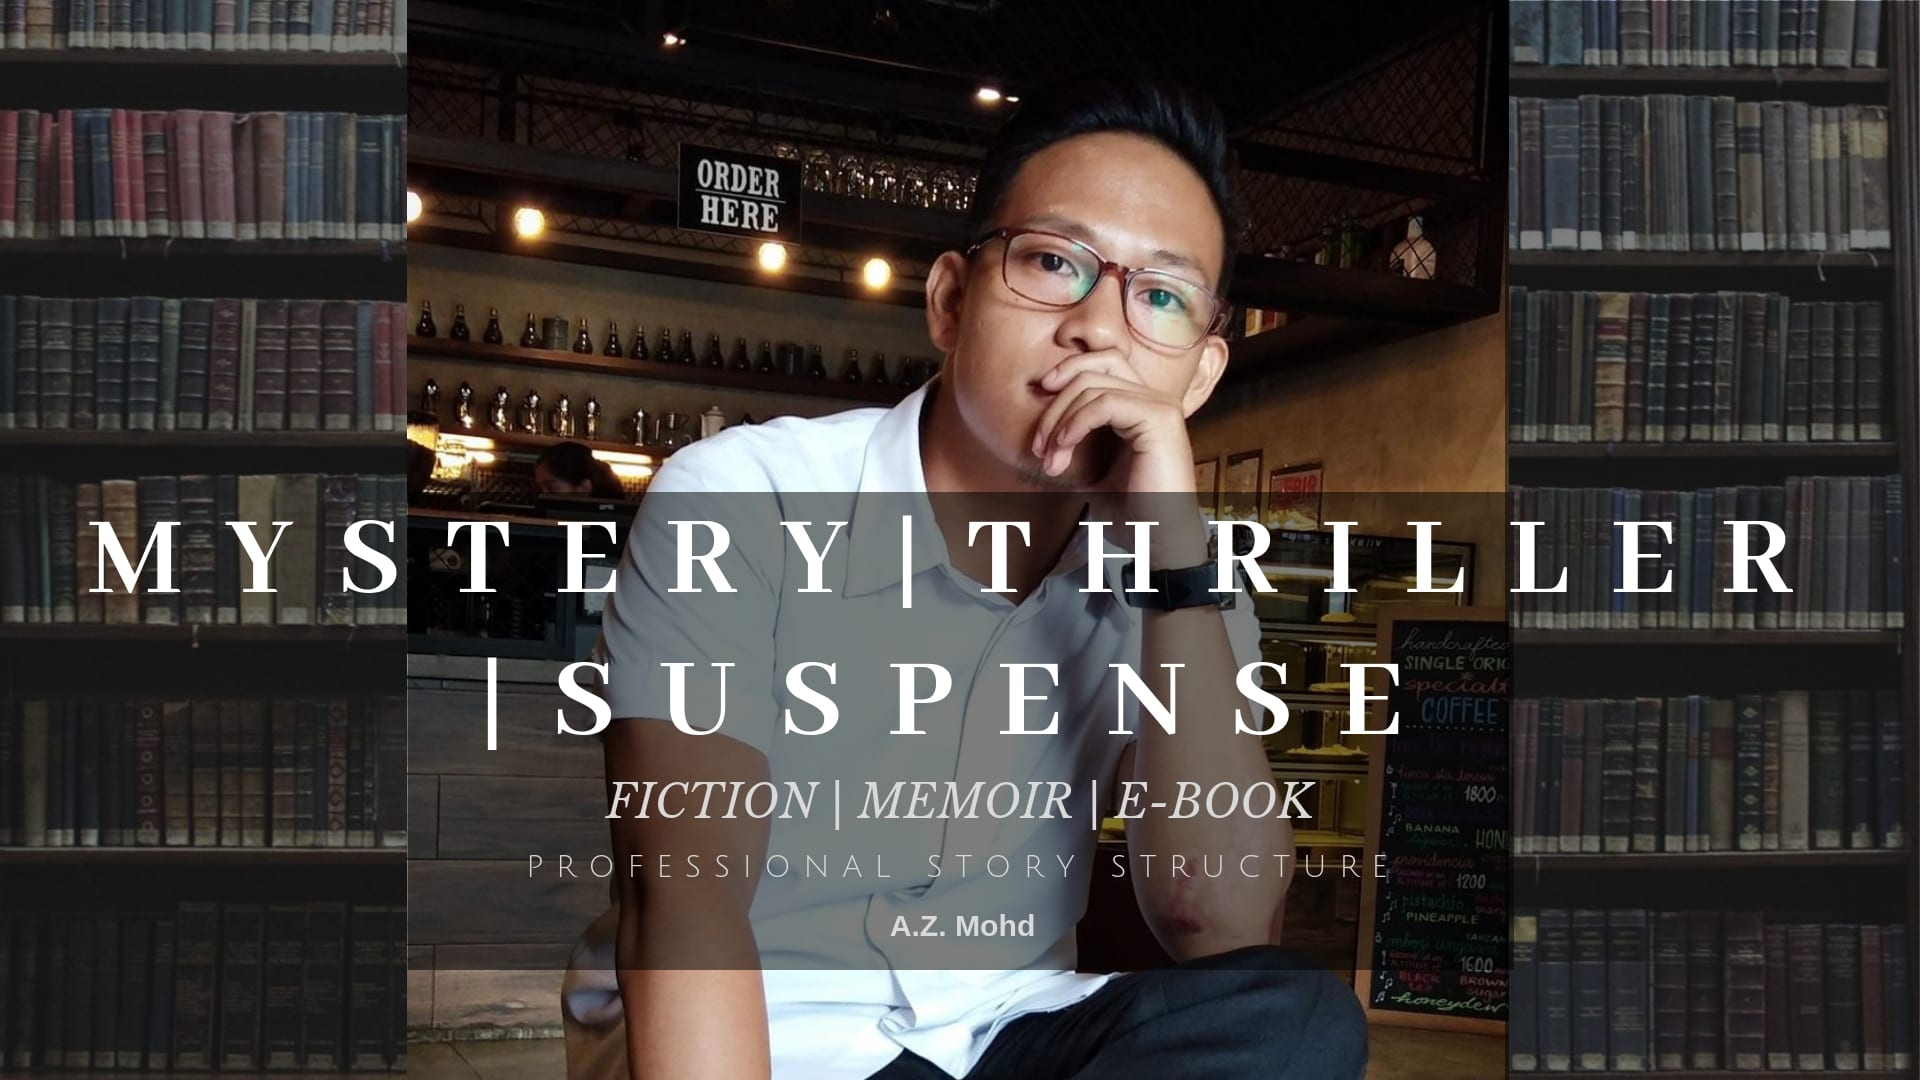 ghostwrite your mystery, thriller, suspense story